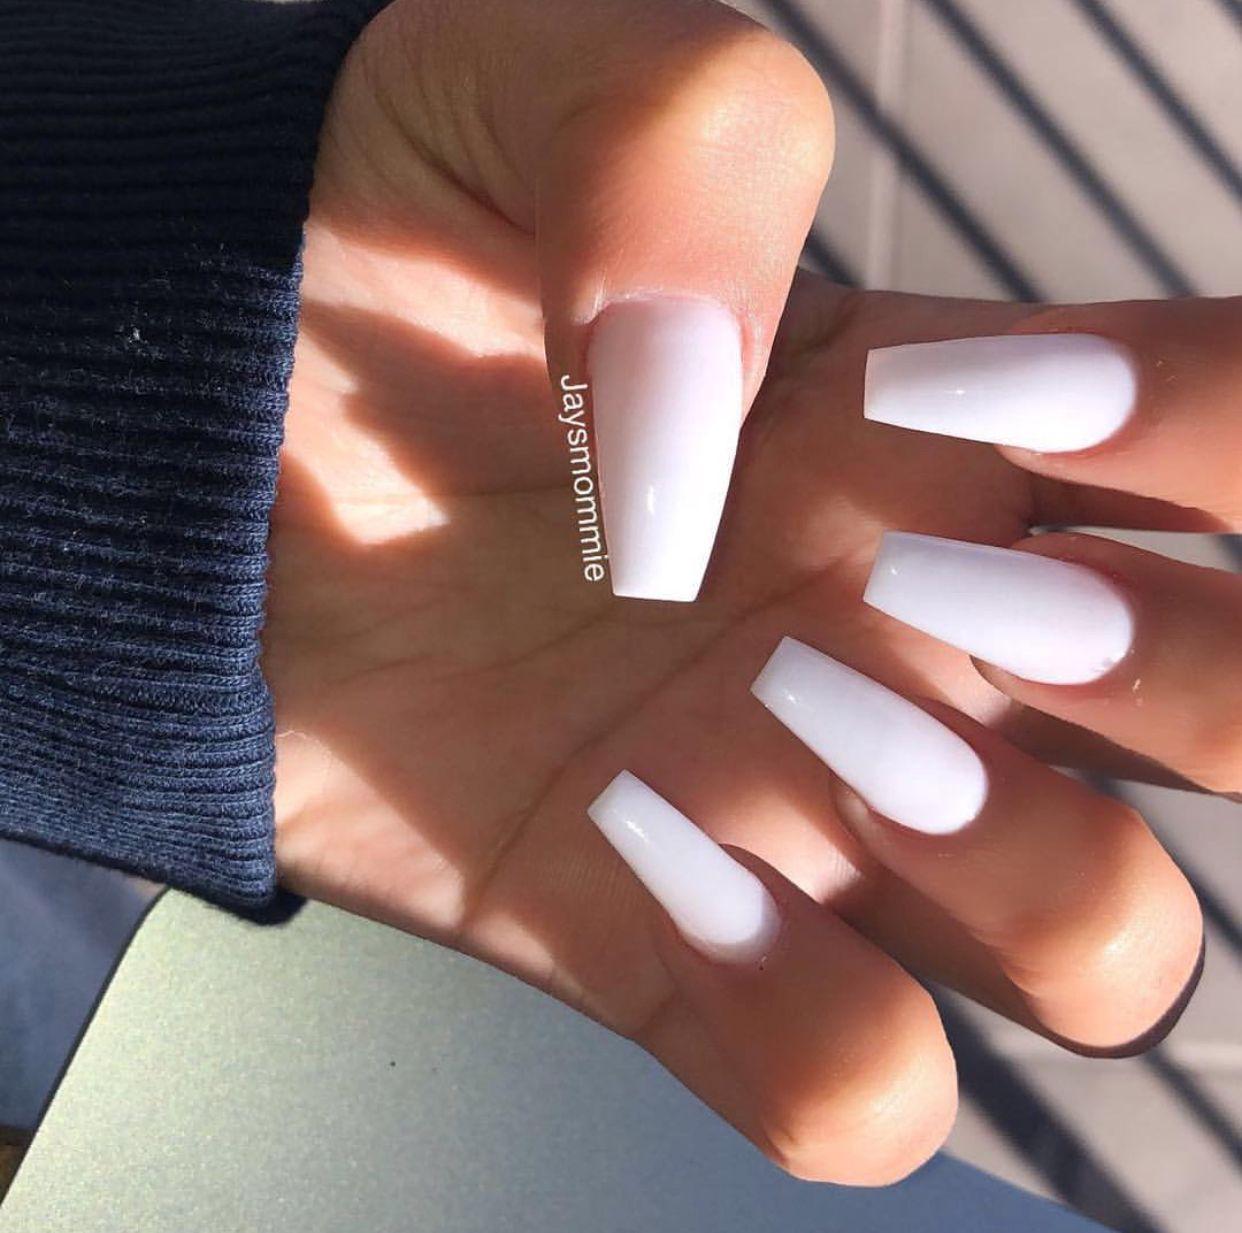 Soft White Glow In The Dark Nails White Acrylic Nails White Gel Nails Acrylic Nail Shapes